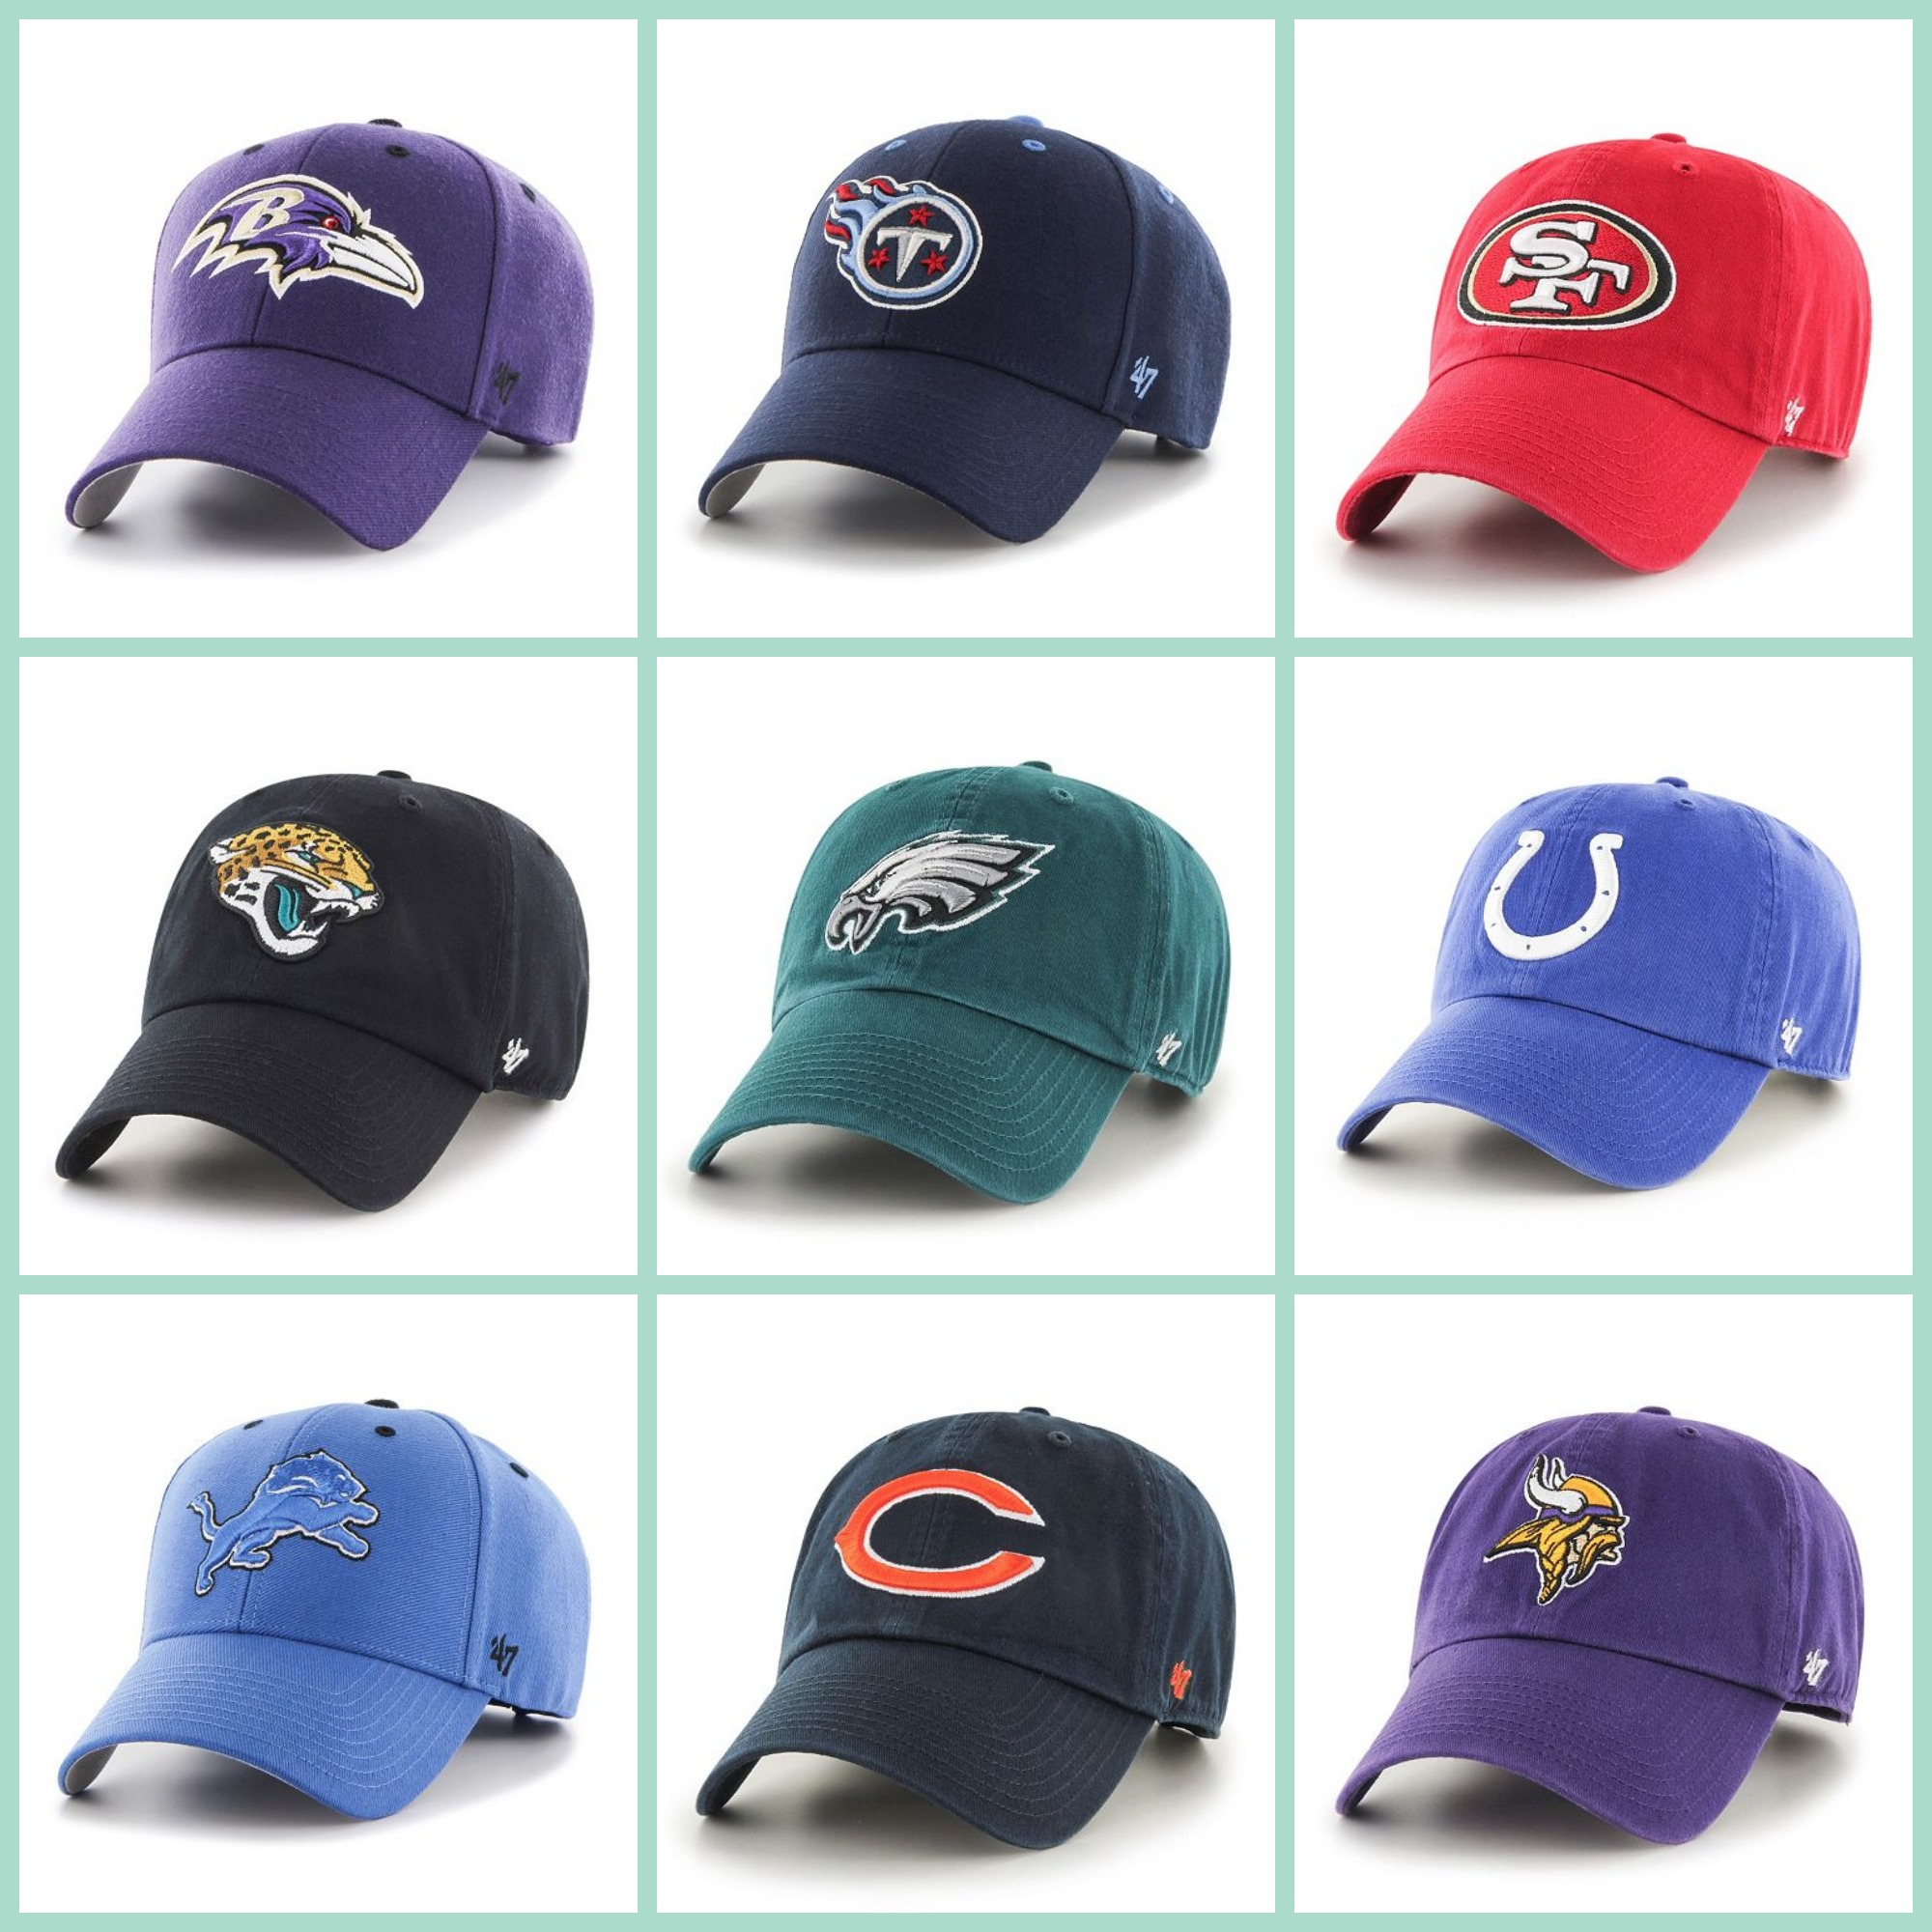 Kohl s  Men s NFL Caps  5.60  b456736008d